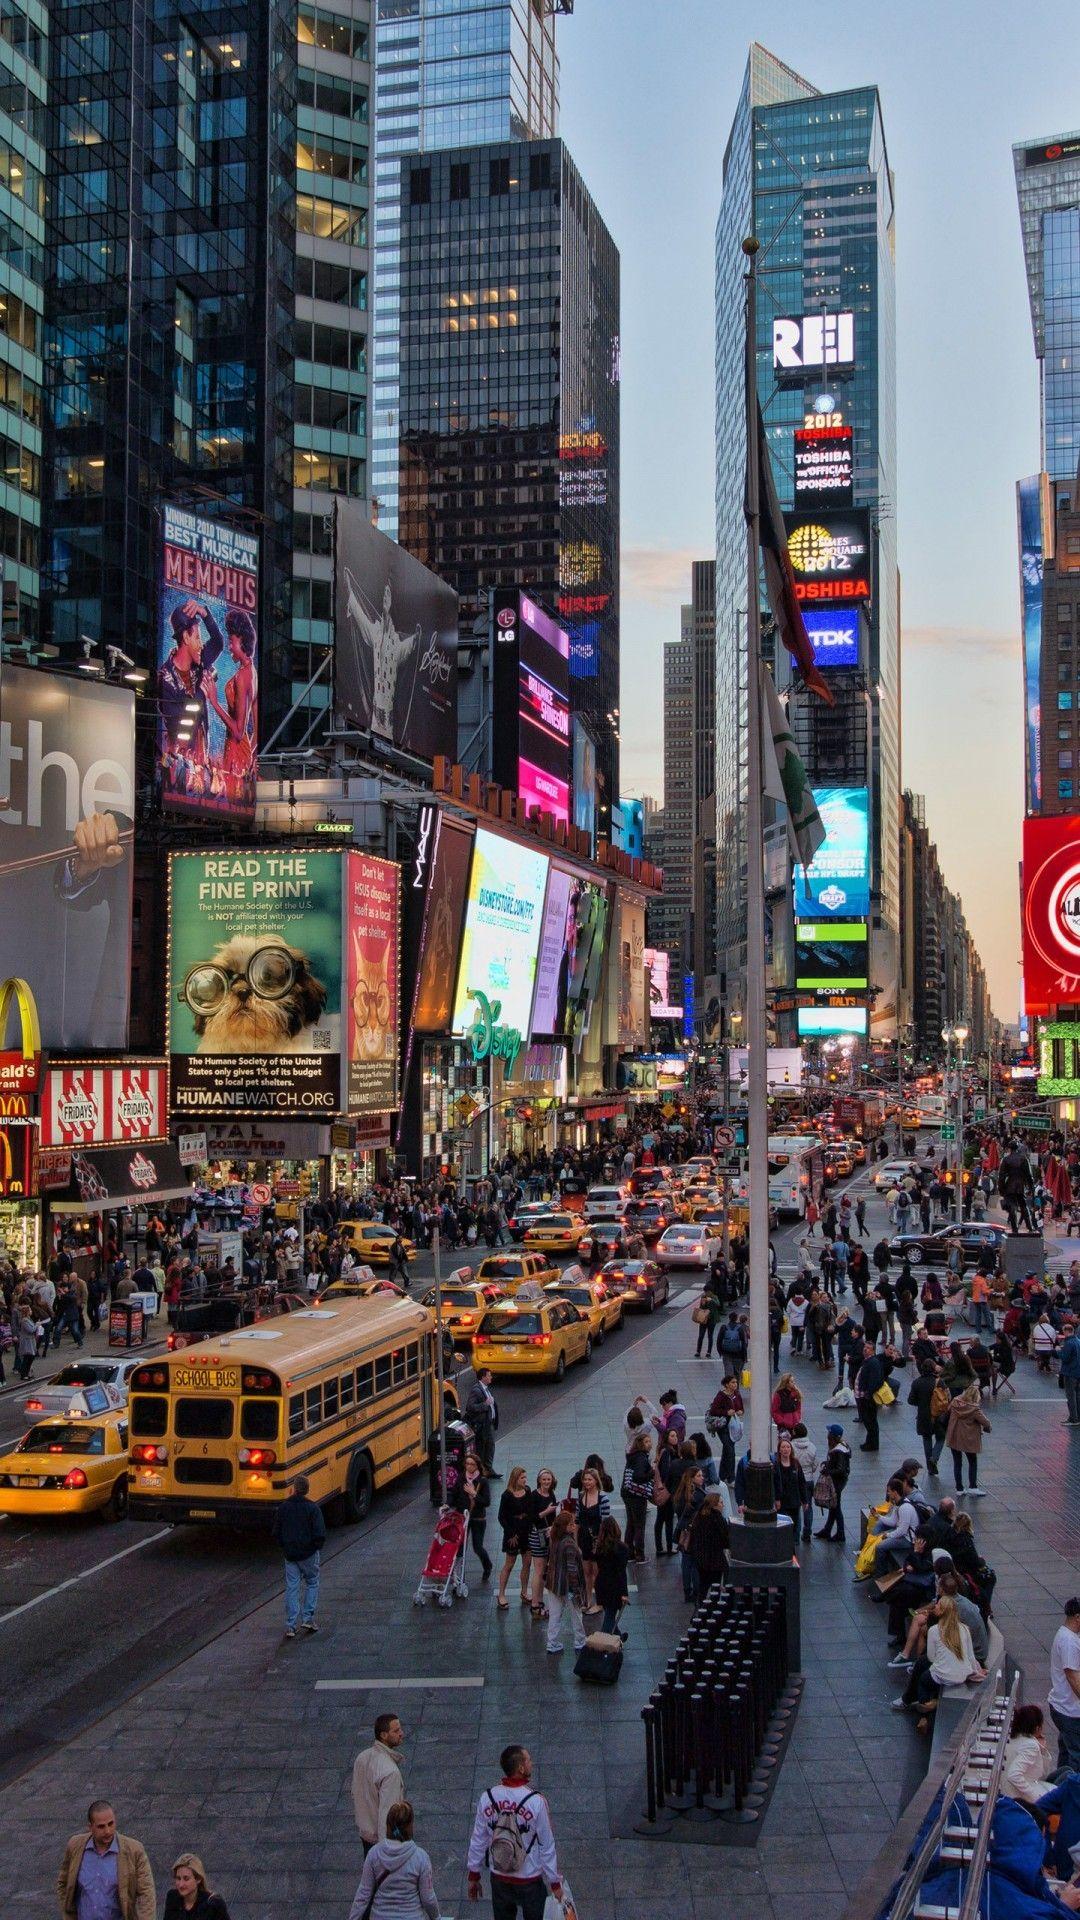 Cars New York City Manhattan Times Square Taxi Wallpapers New York City Background New York Wallpaper New York City Ny